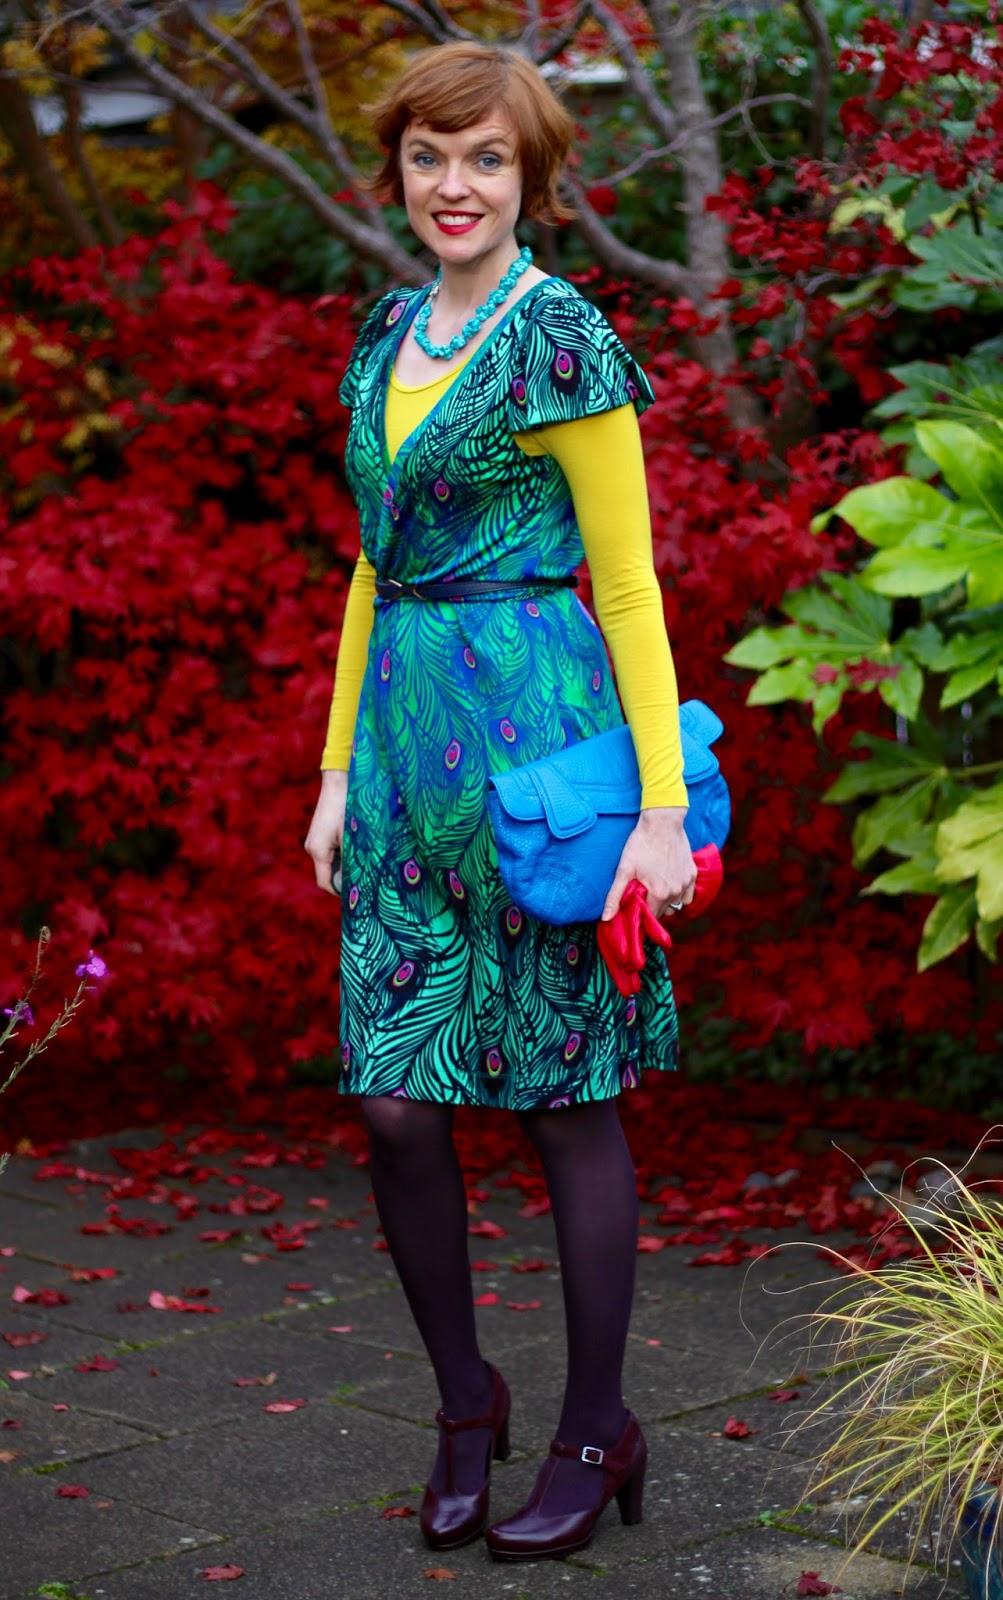 Fake Fabulous | Peacock Wrap dress & Bold Colours, over 40!